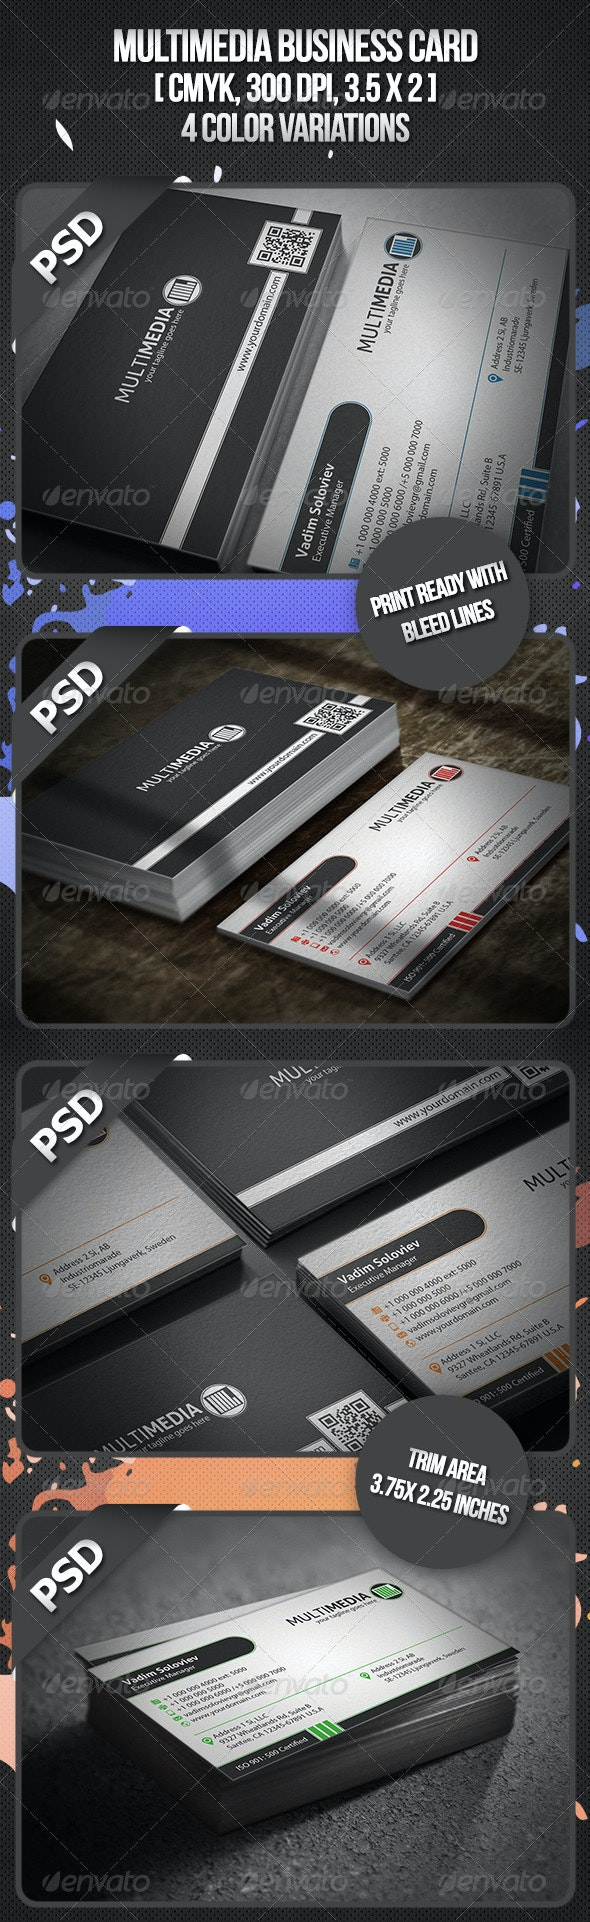 Multimedia Business Card - Corporate Business Cards